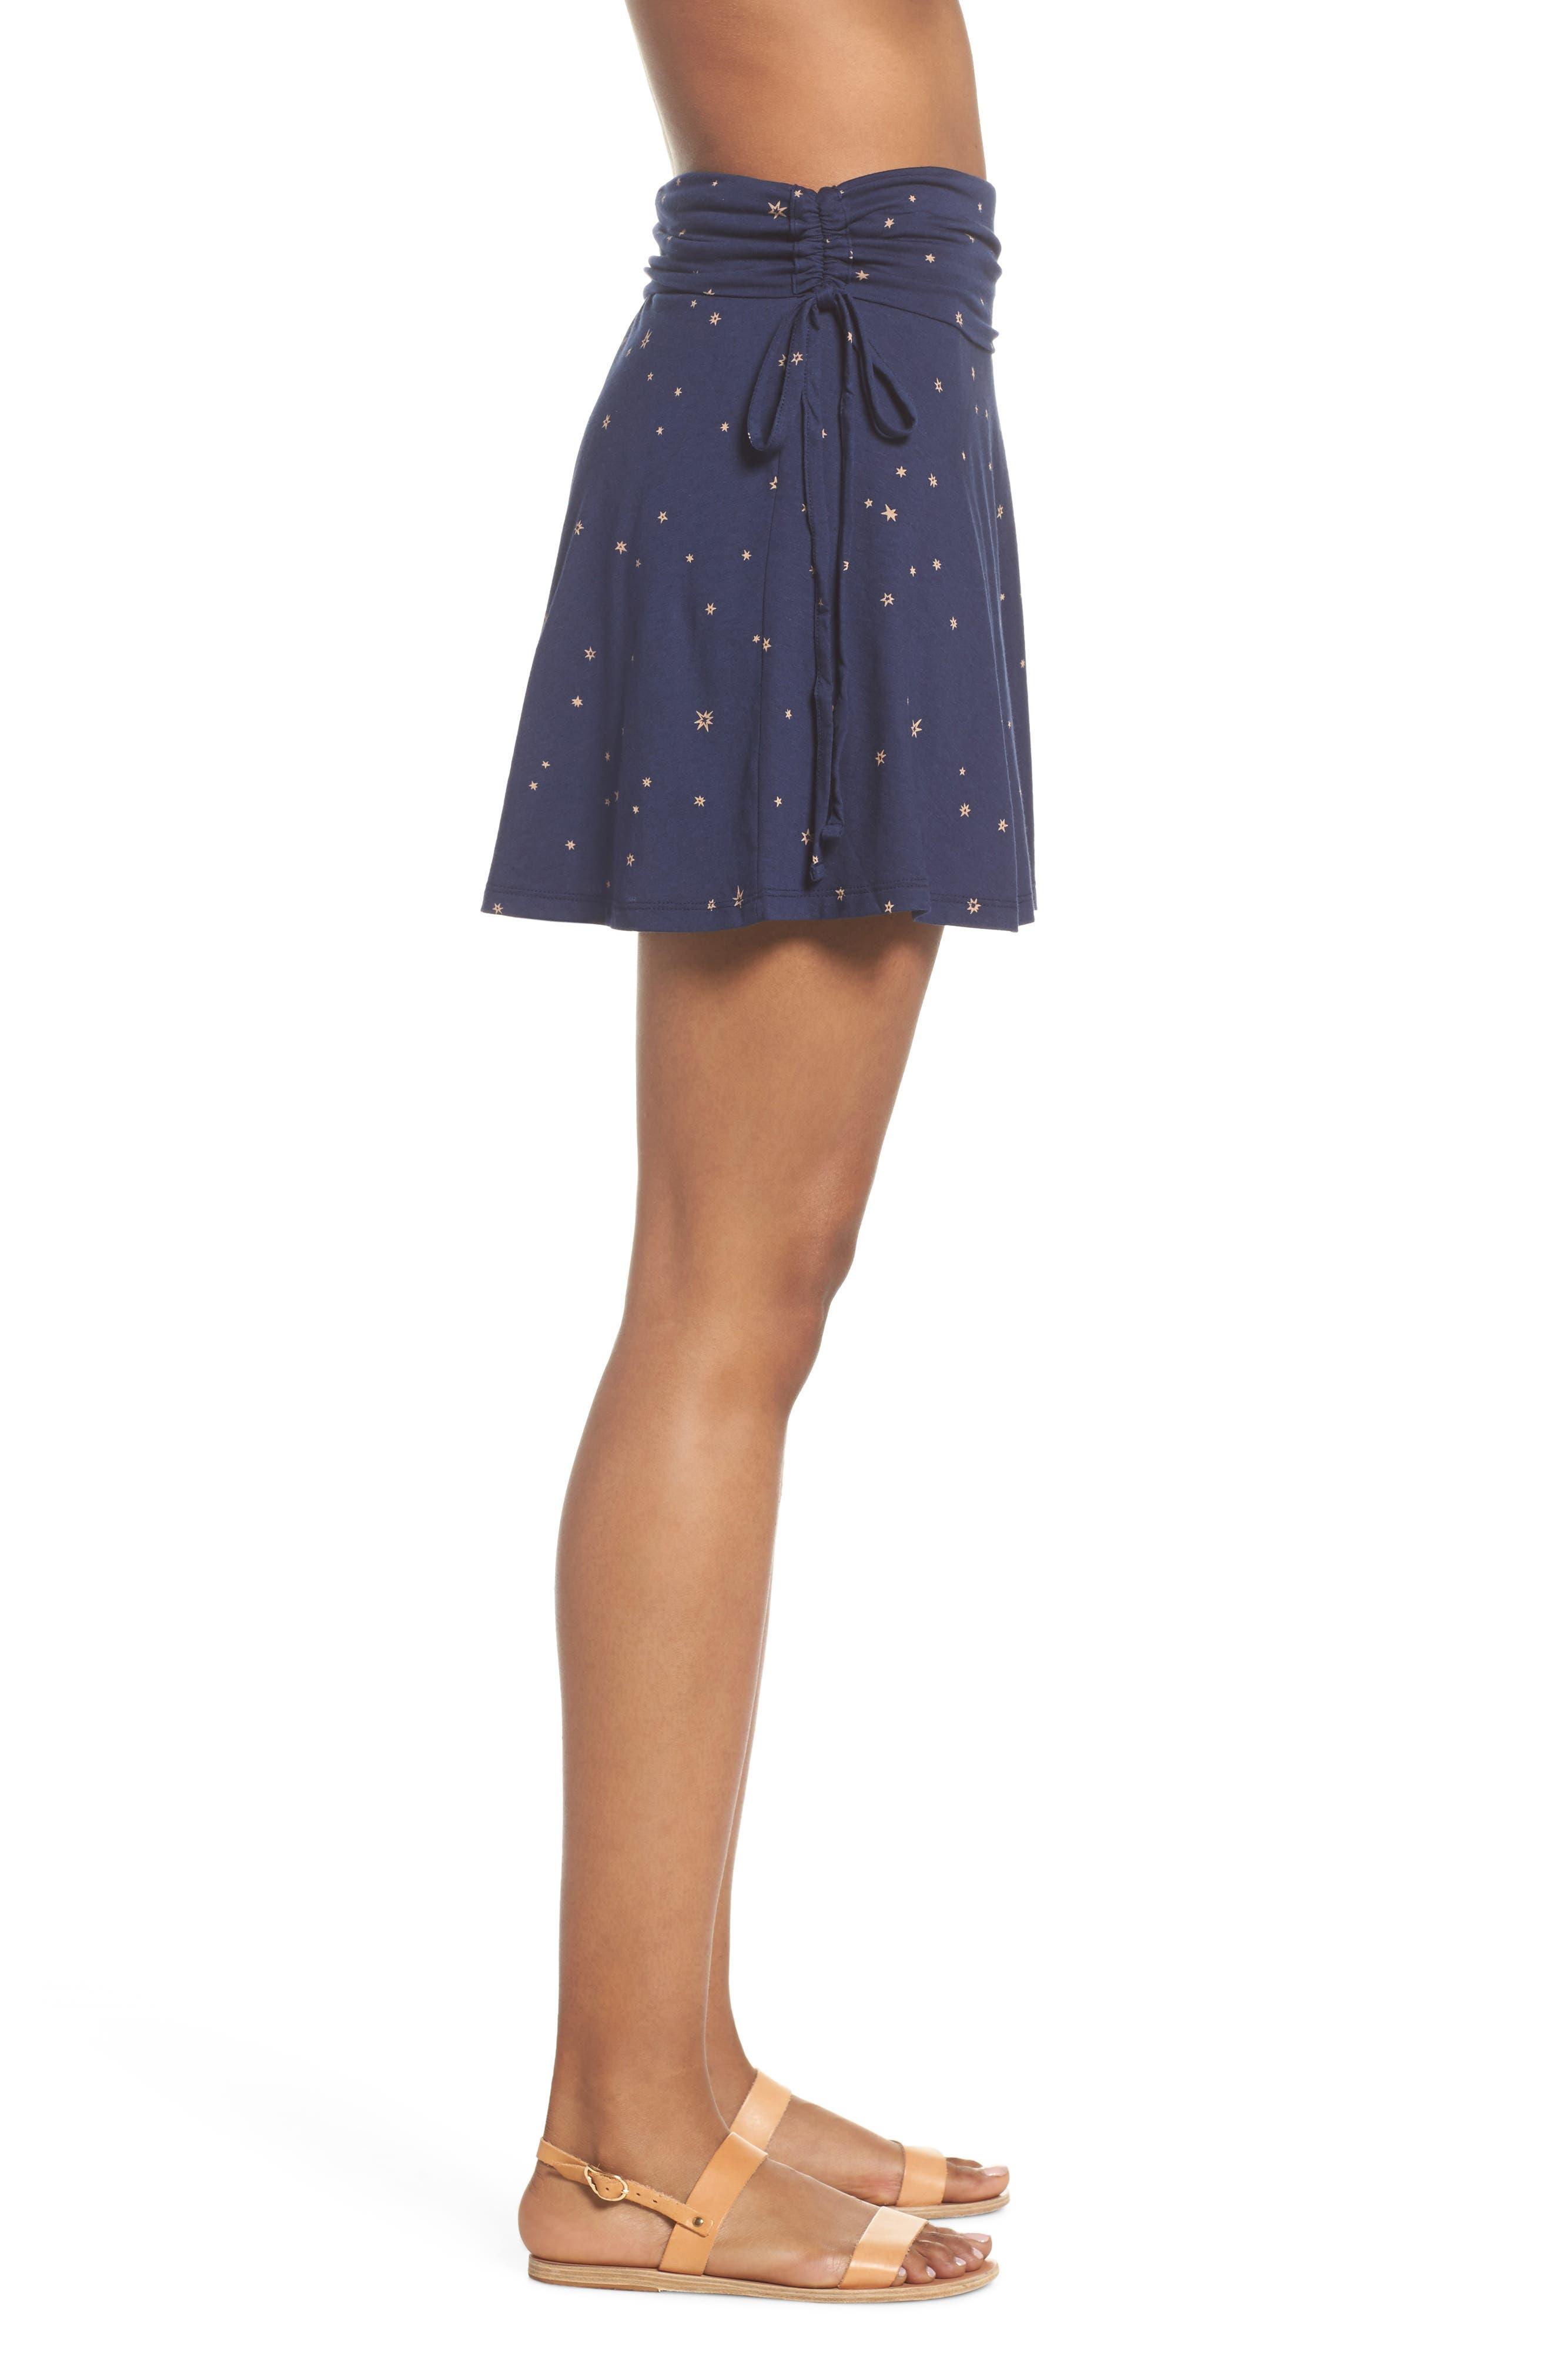 Lithia Cotton Blend Skirt,                             Alternate thumbnail 3, color,                             Micr Mica Pop Classic Navy